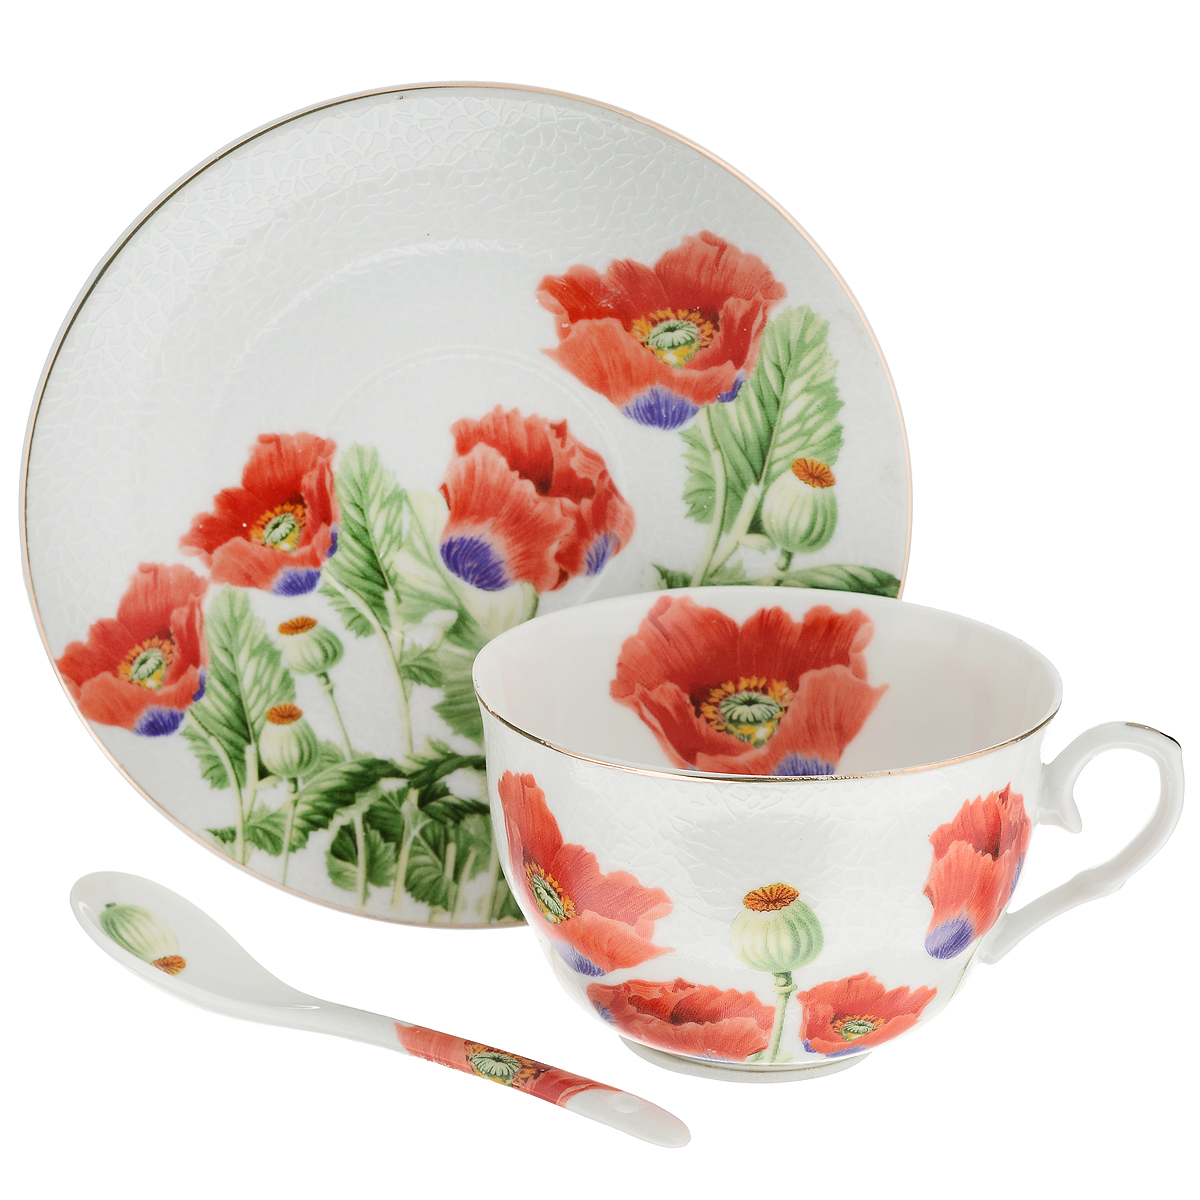 Набор чайный Briswild Цветы мака, 3 предмета